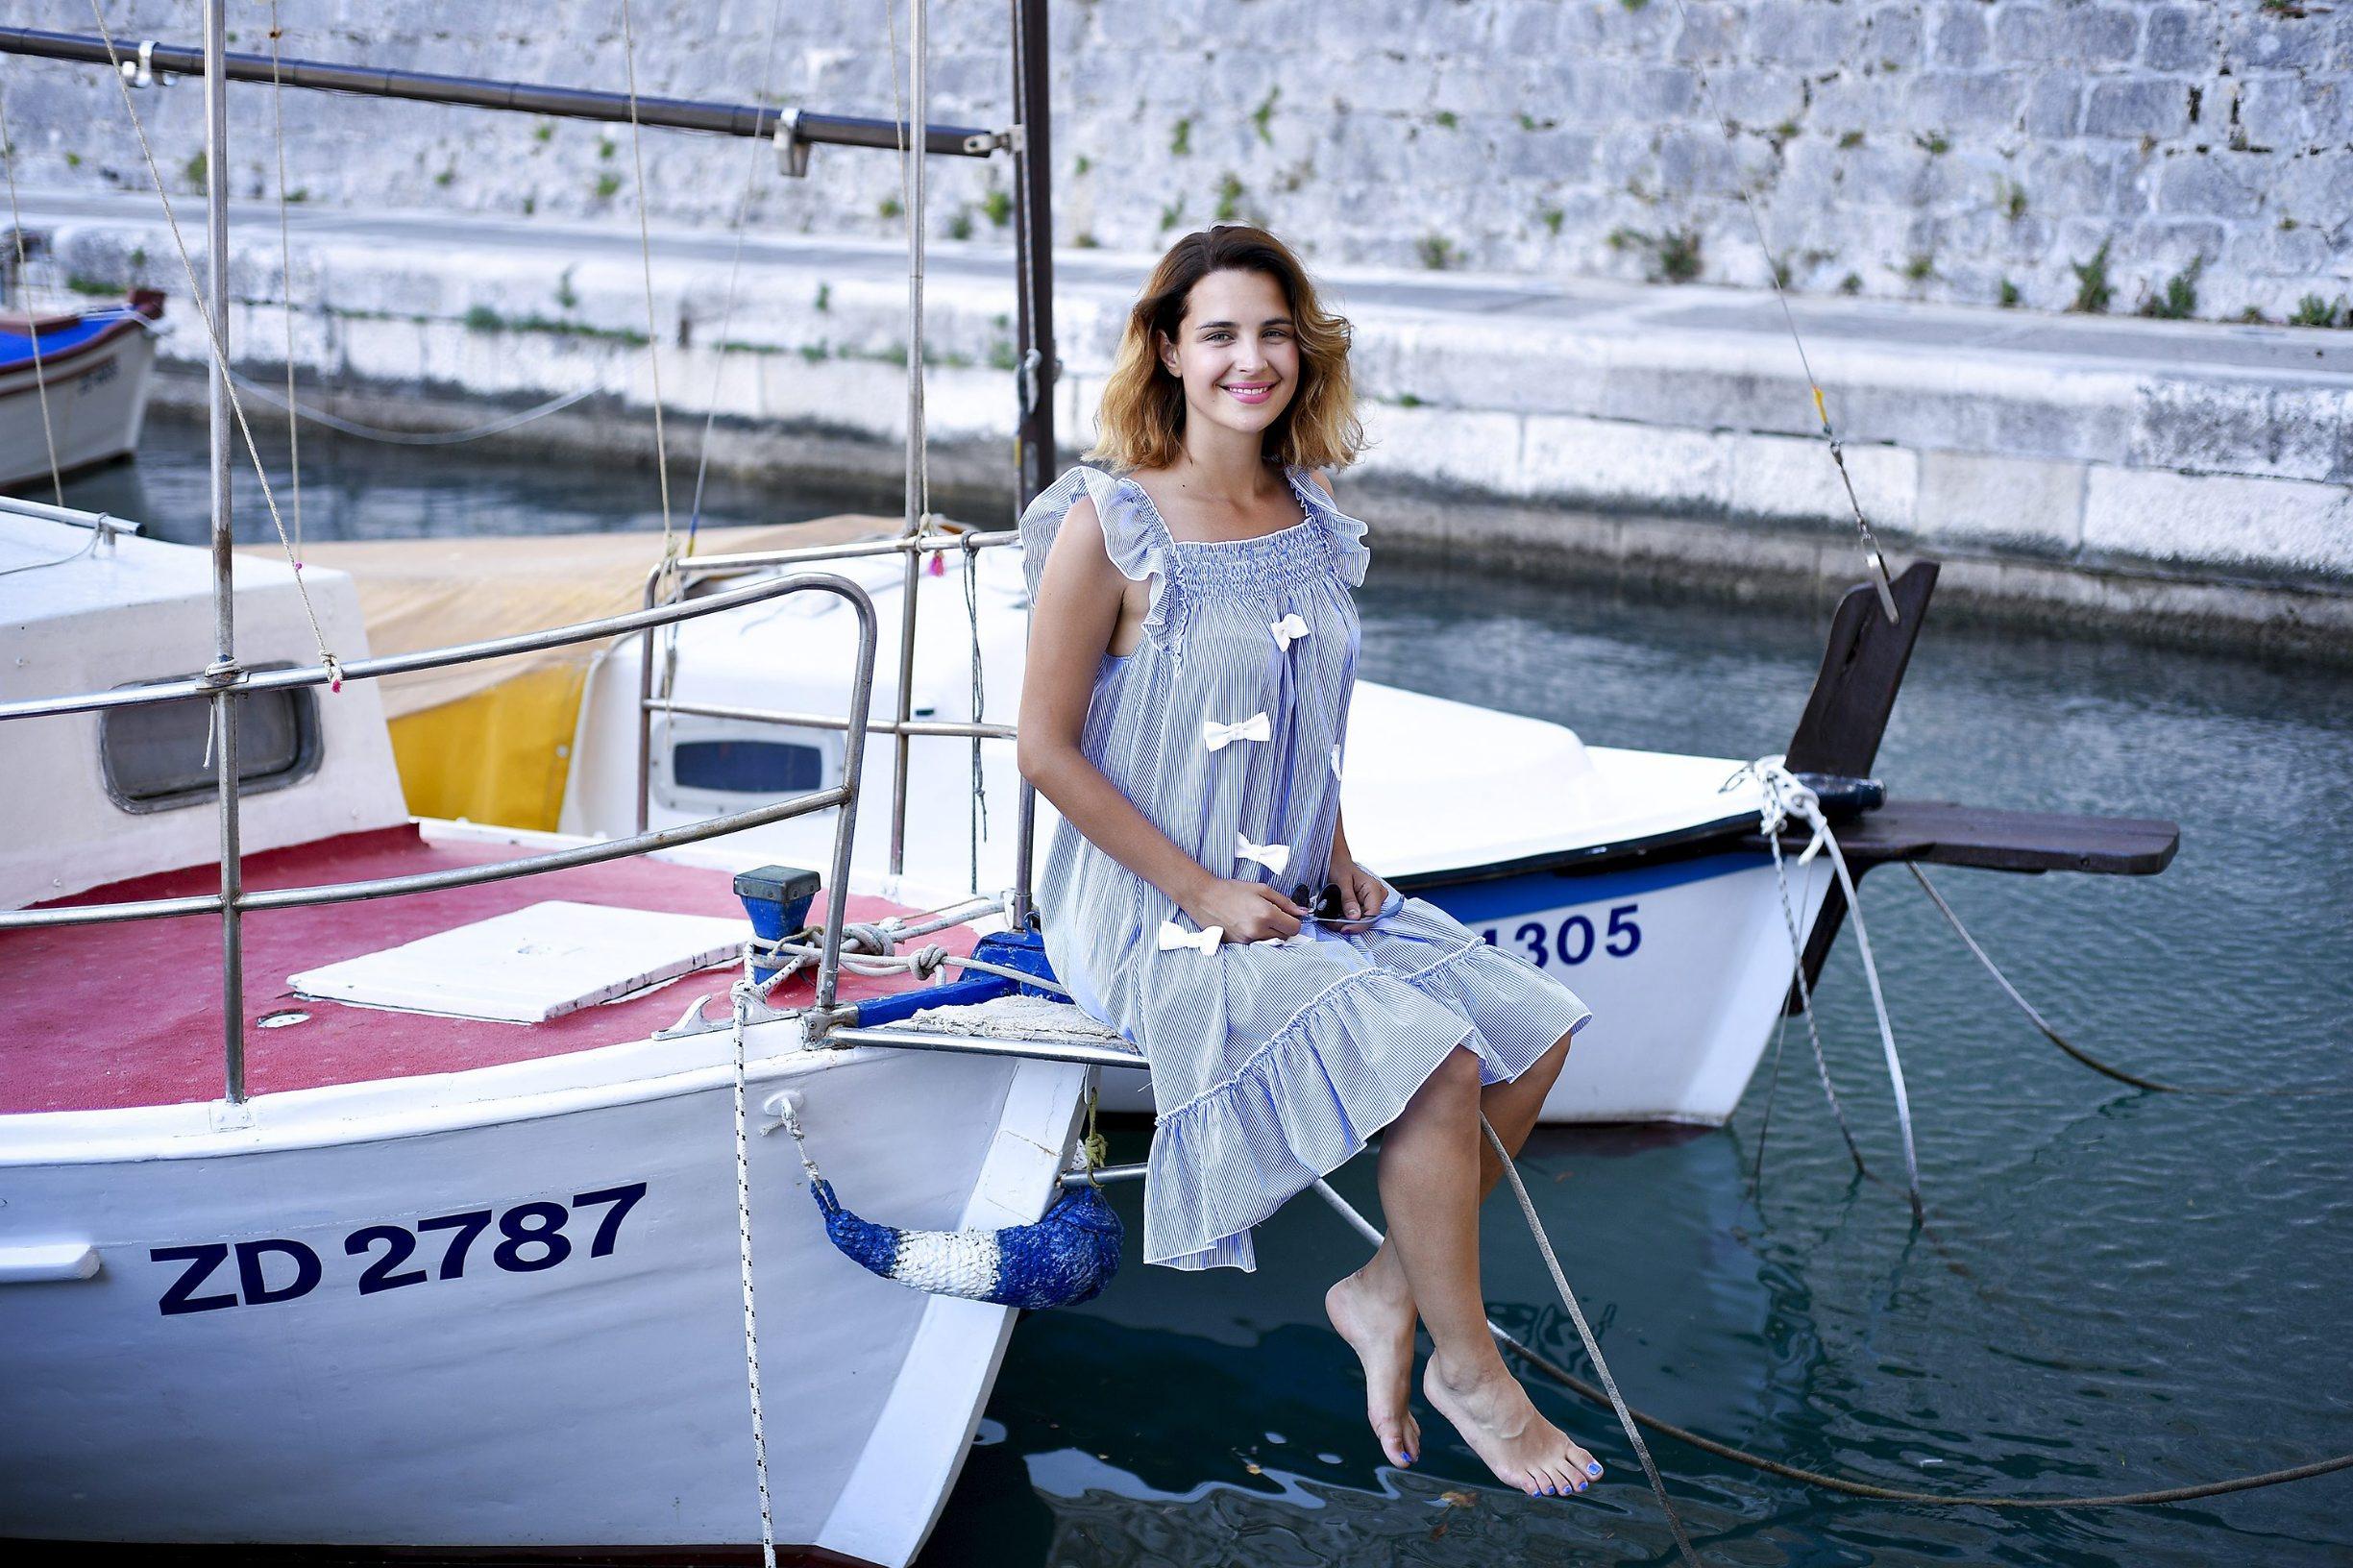 Zadar, 150717. Glumica Doris Pincic Rogoznica, fotografirana na barci svog oca. Foto: Boris Kovacev / CROPIX